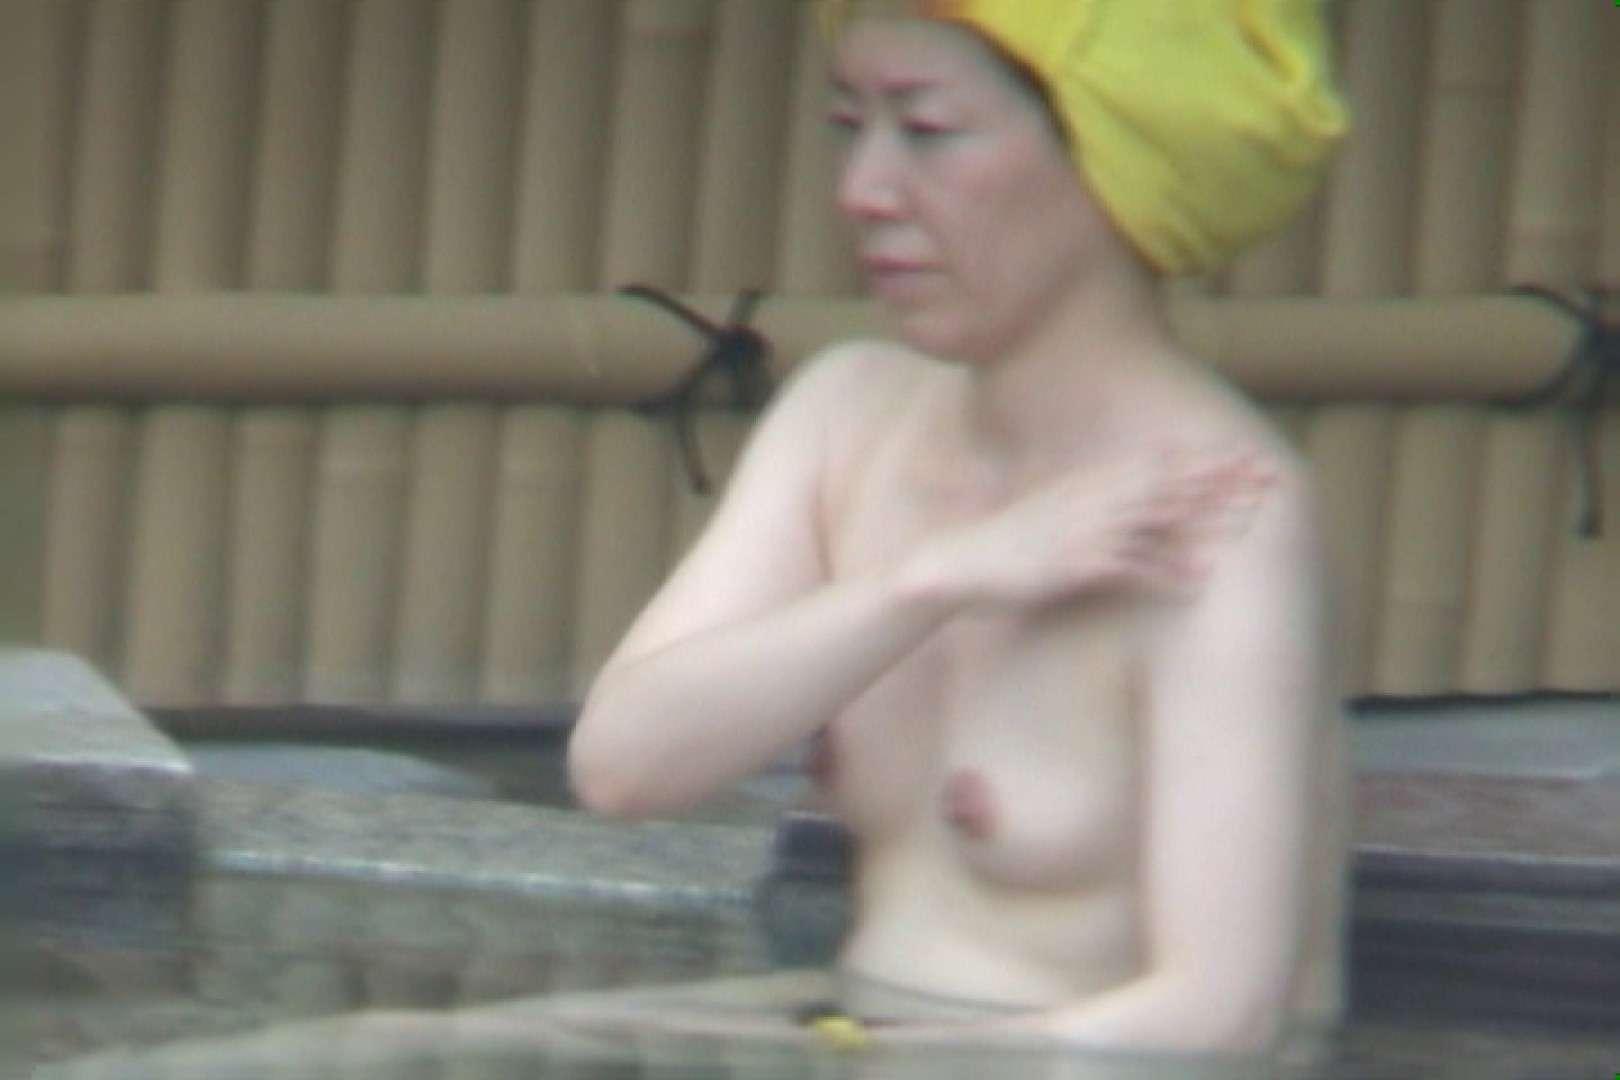 Aquaな露天風呂Vol.569 盗撮シリーズ | 露天風呂編  84PIX 73